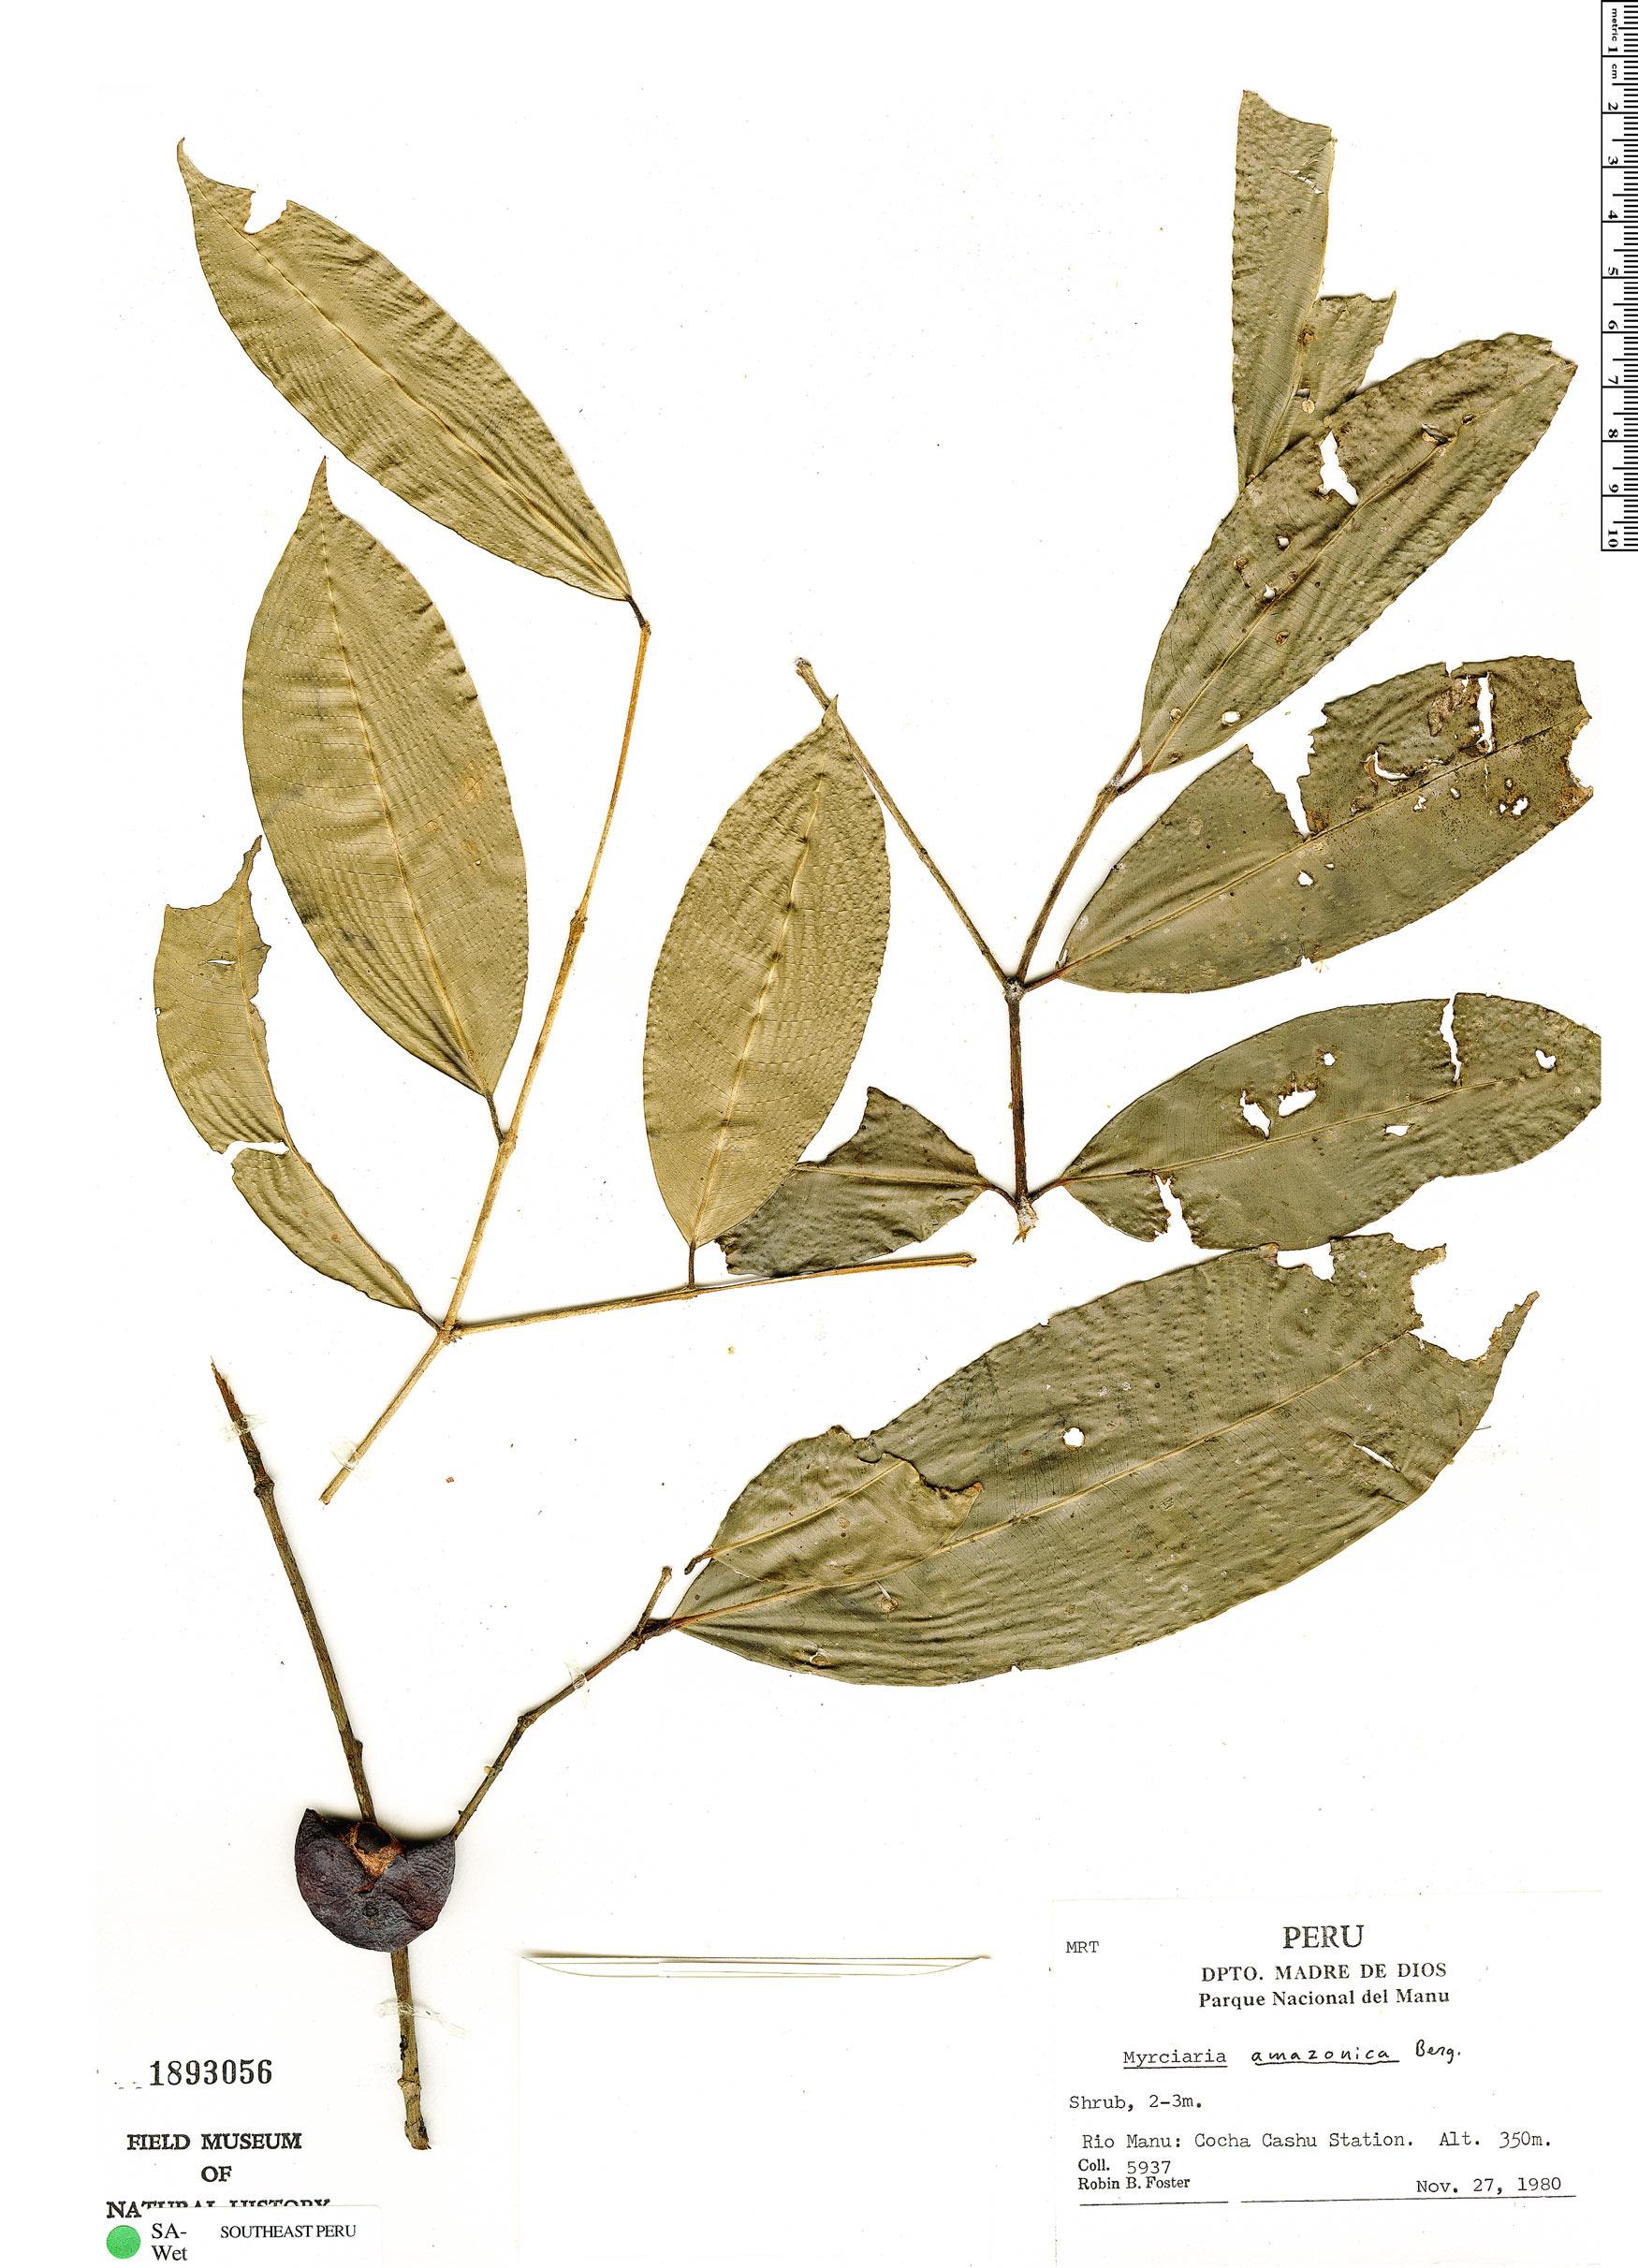 Specimen: Myrciaria amazonica